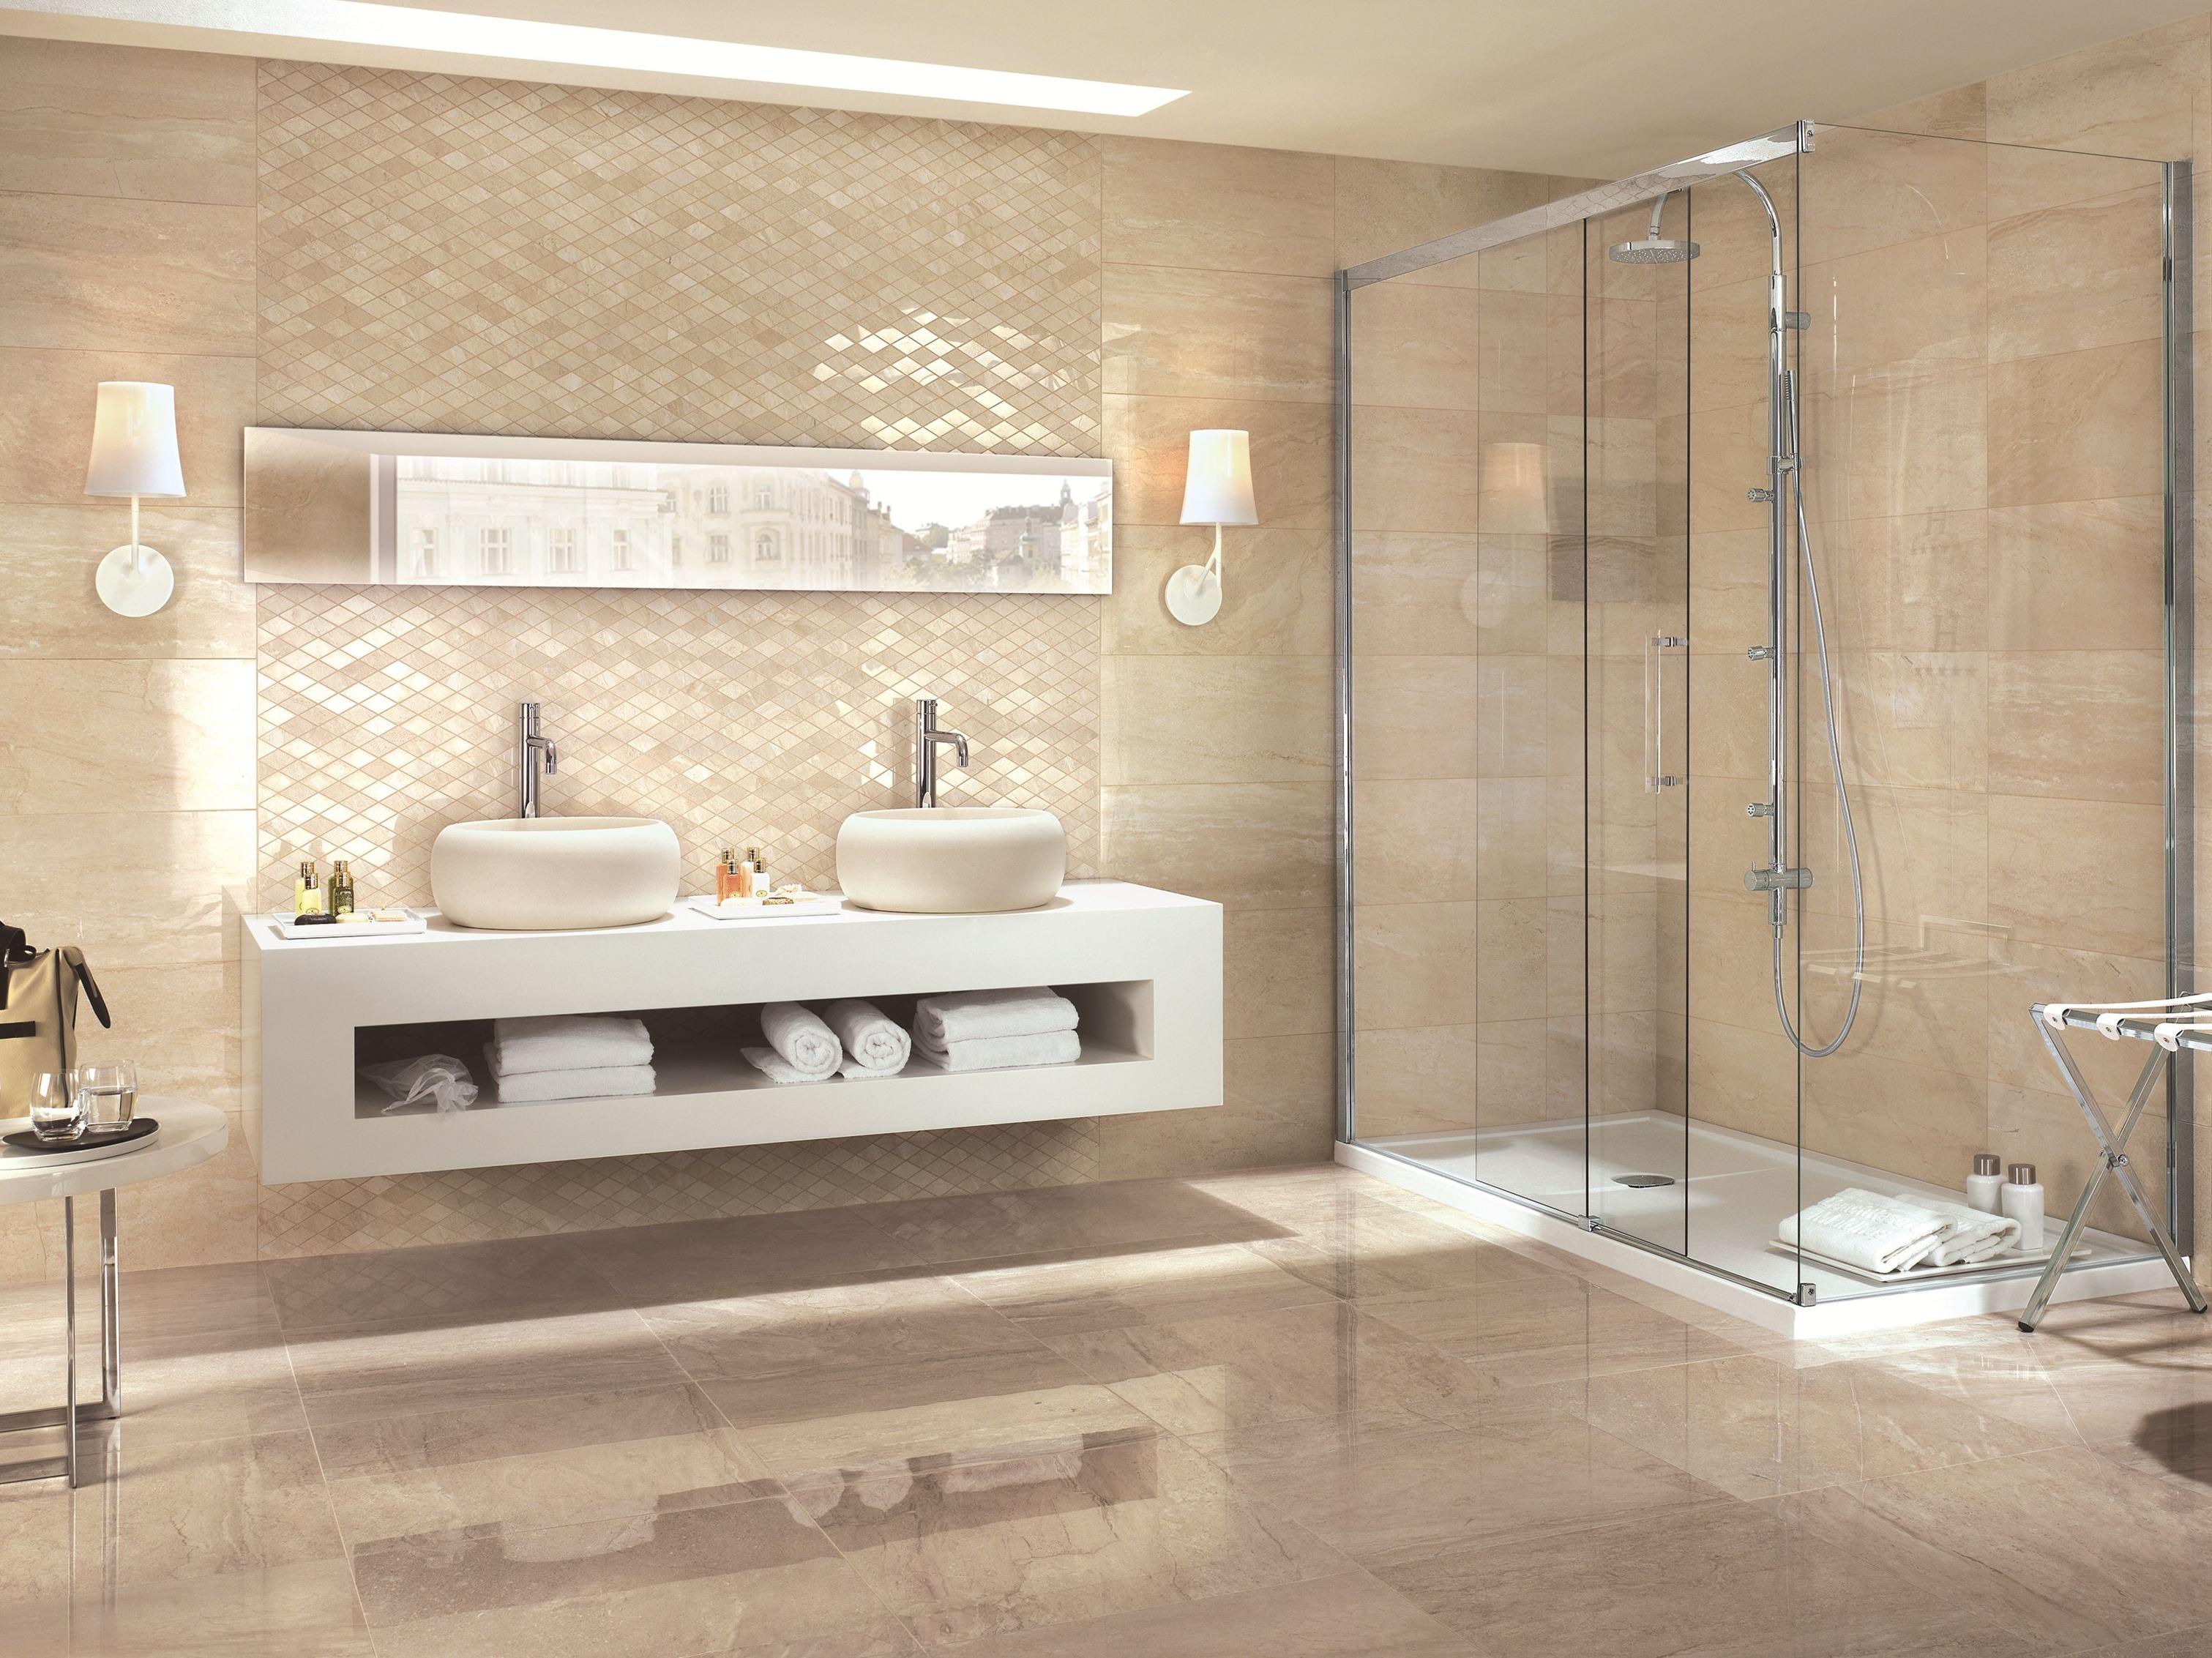 Бежевая ванная комната интерьер